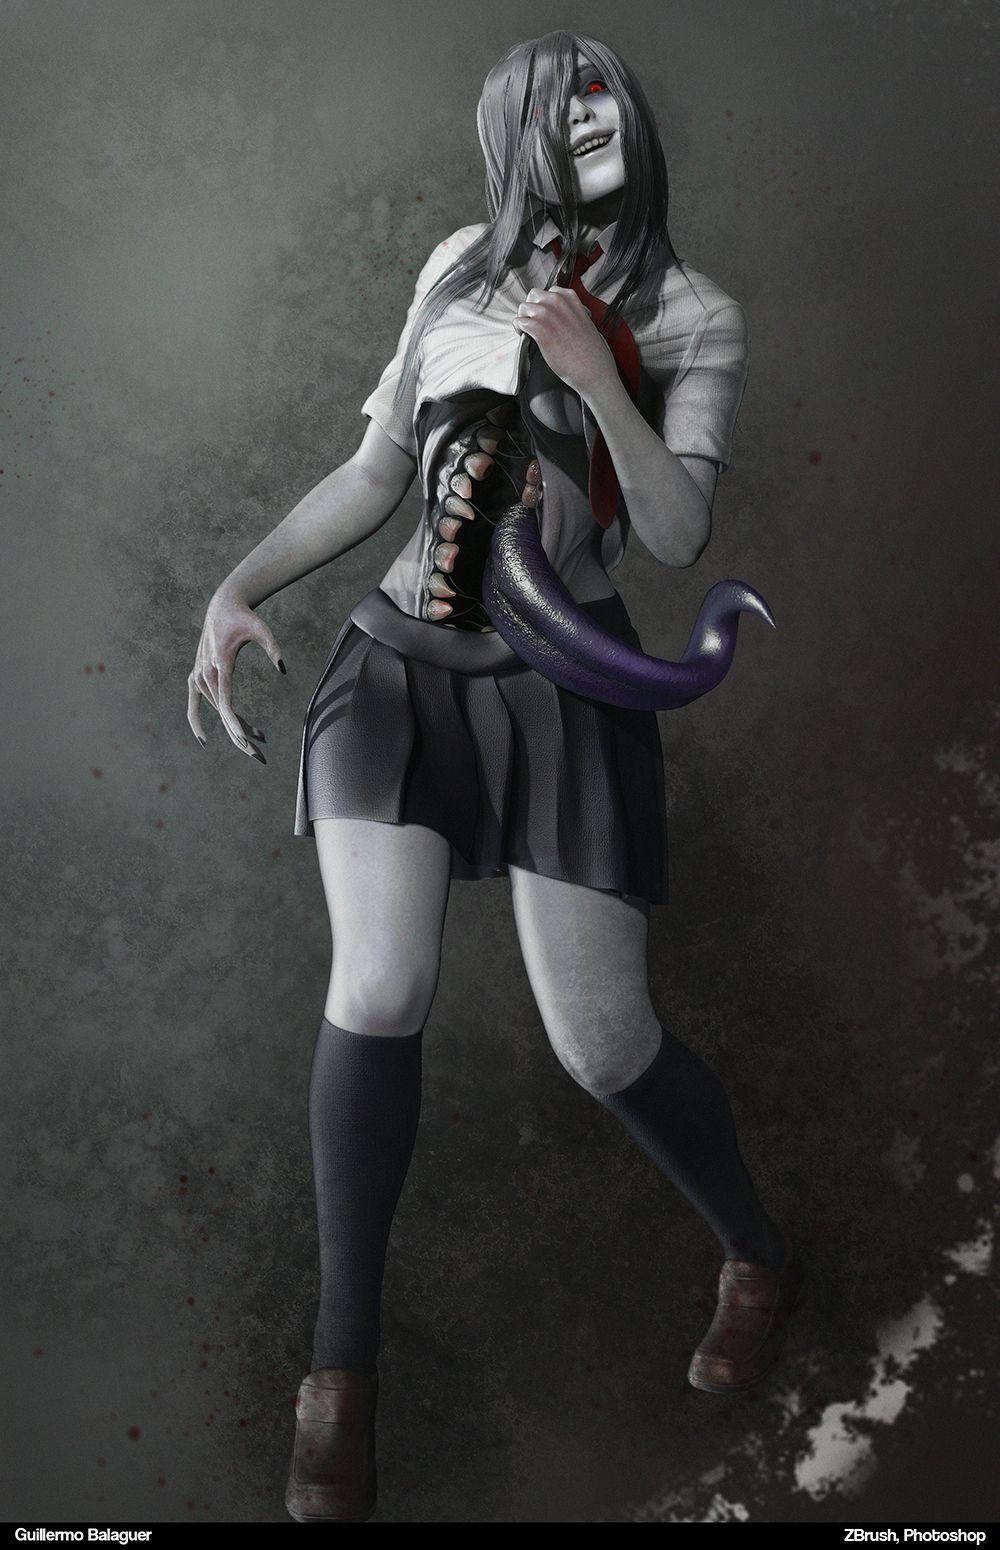 Onryo Japanese Ghost Girl Japanese Myth Comics Girls Japanese Urban Legends